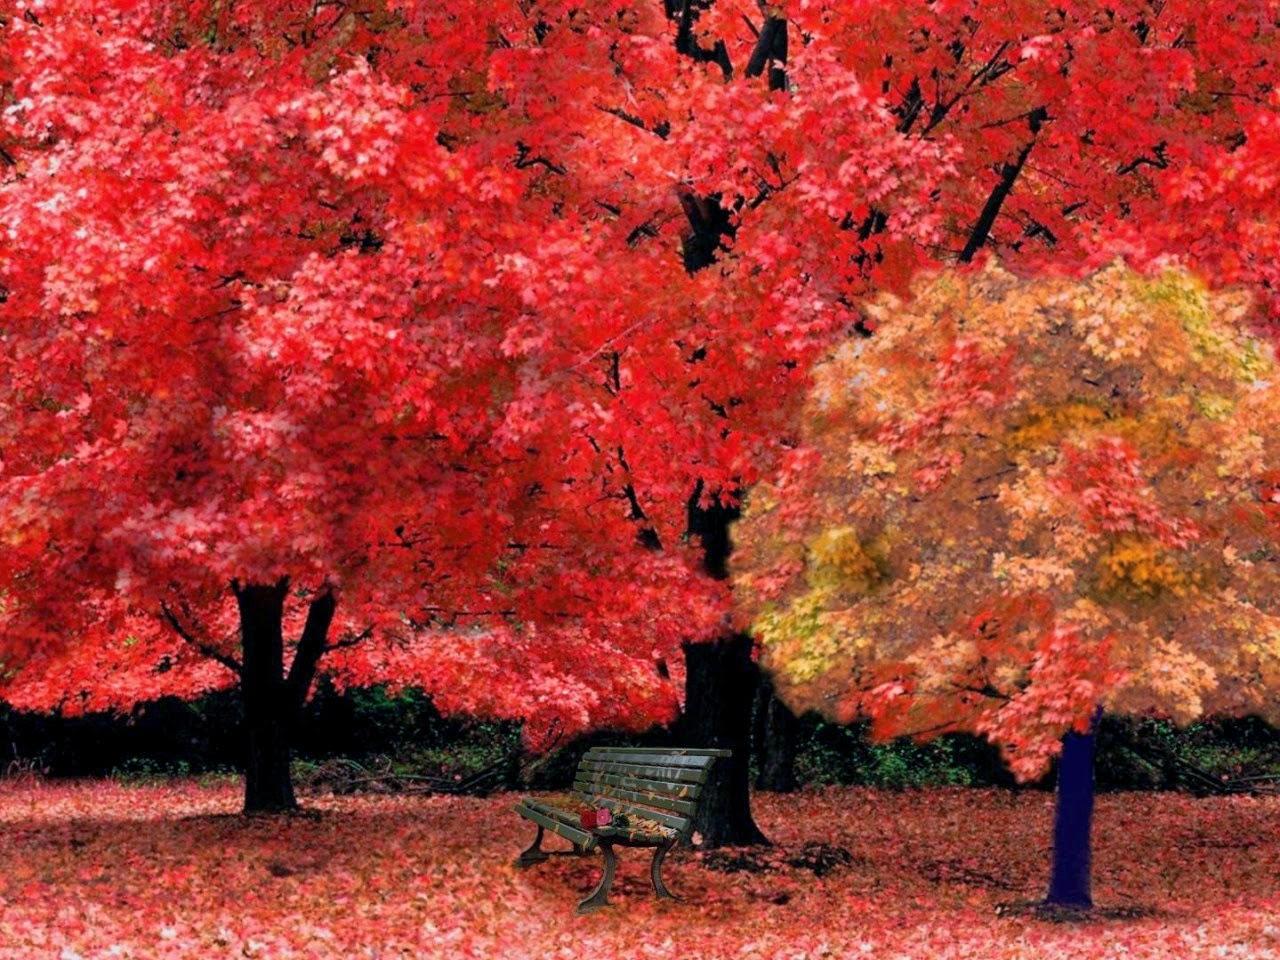 red autumn flower hd 720p photos